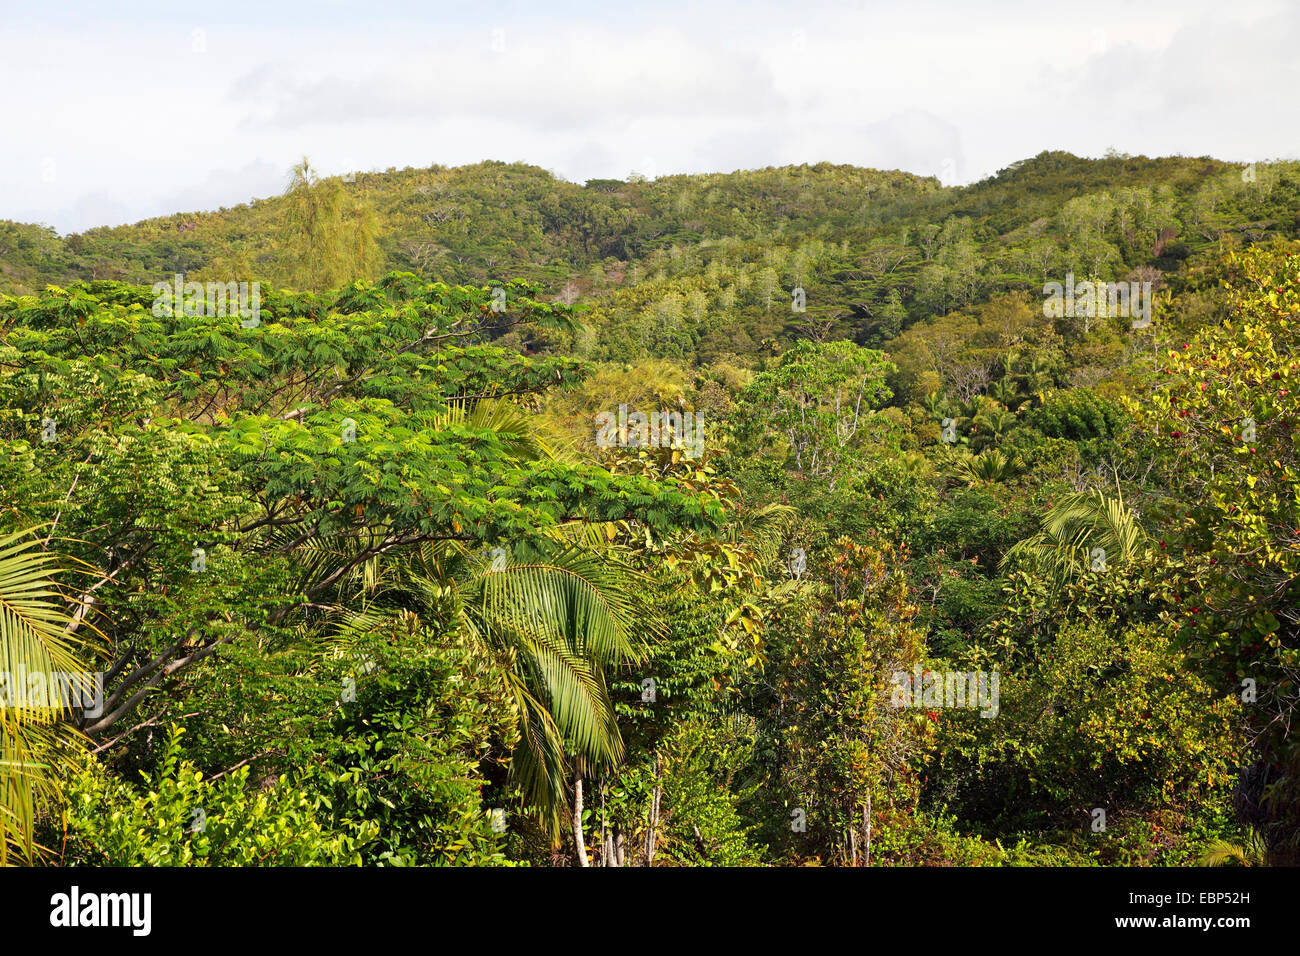 primeval forest, Seychelles, Vallee de Mai National Park, Praslin - Stock Image